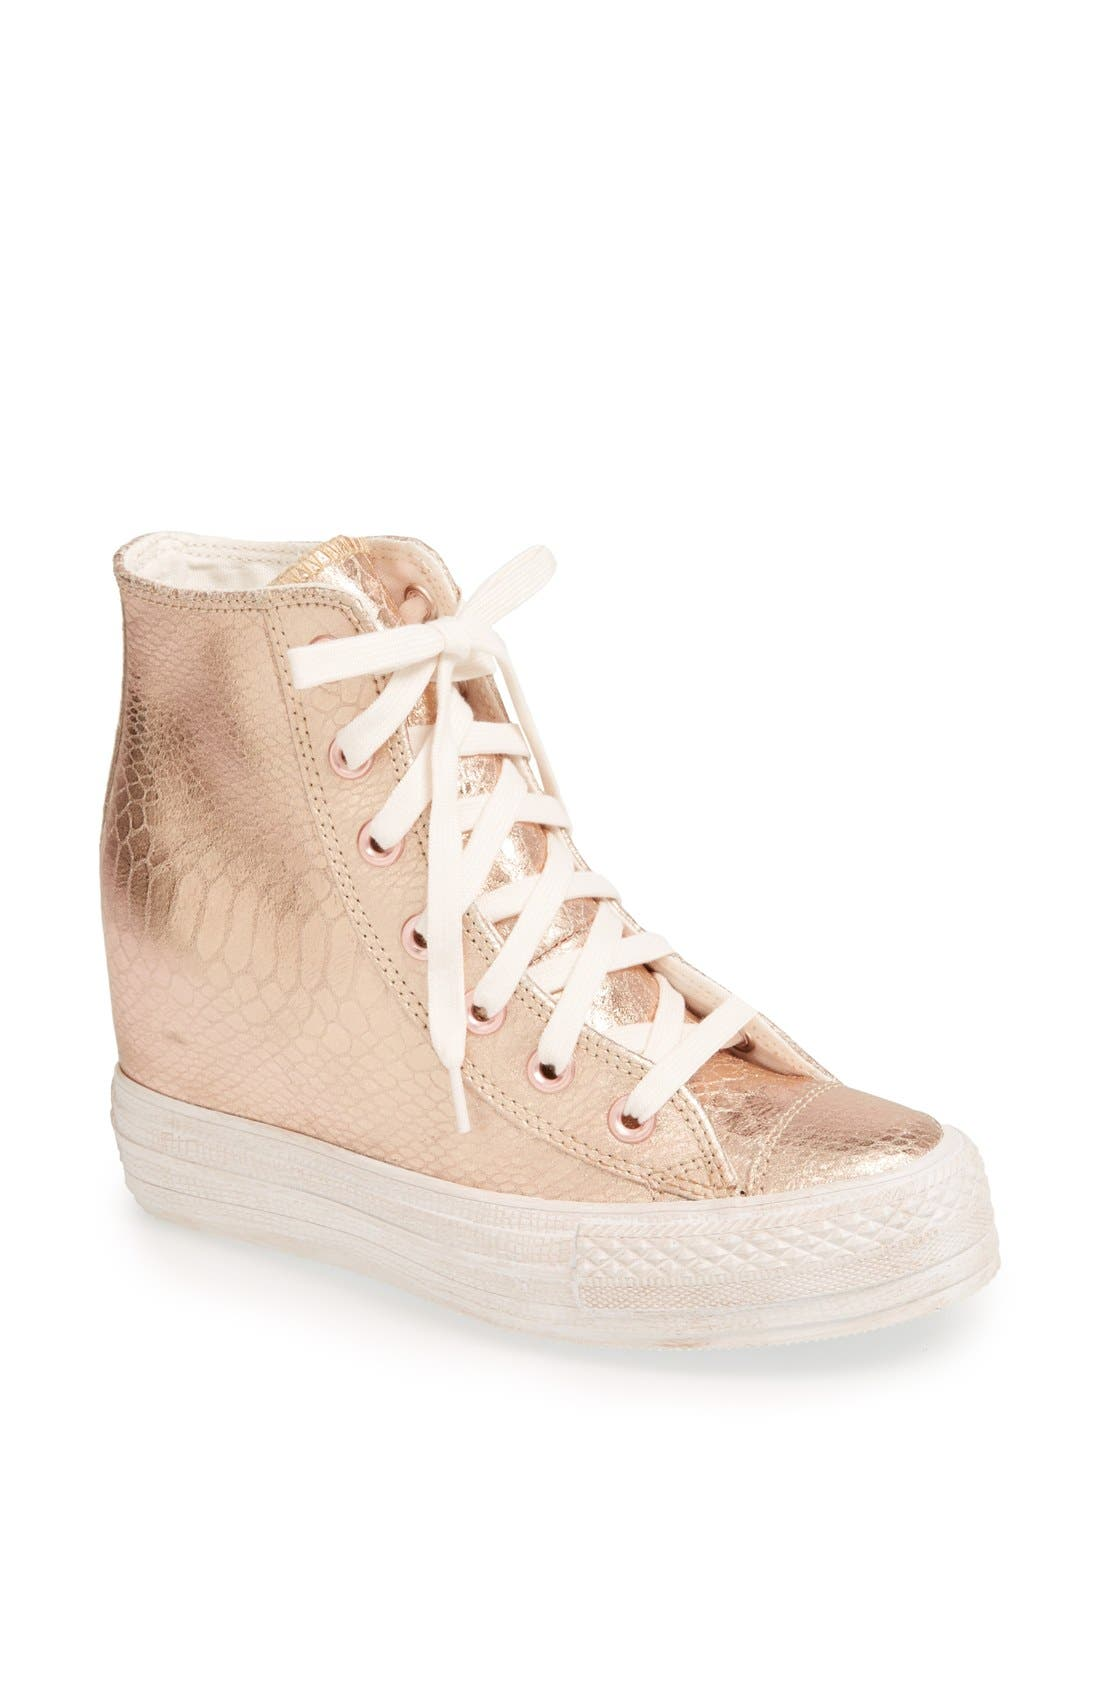 Alternate Image 1 Selected - Chuck Taylor® All Star® 'Platform Plus' Hidden Wedge Leather High-Top Sneaker (Women)